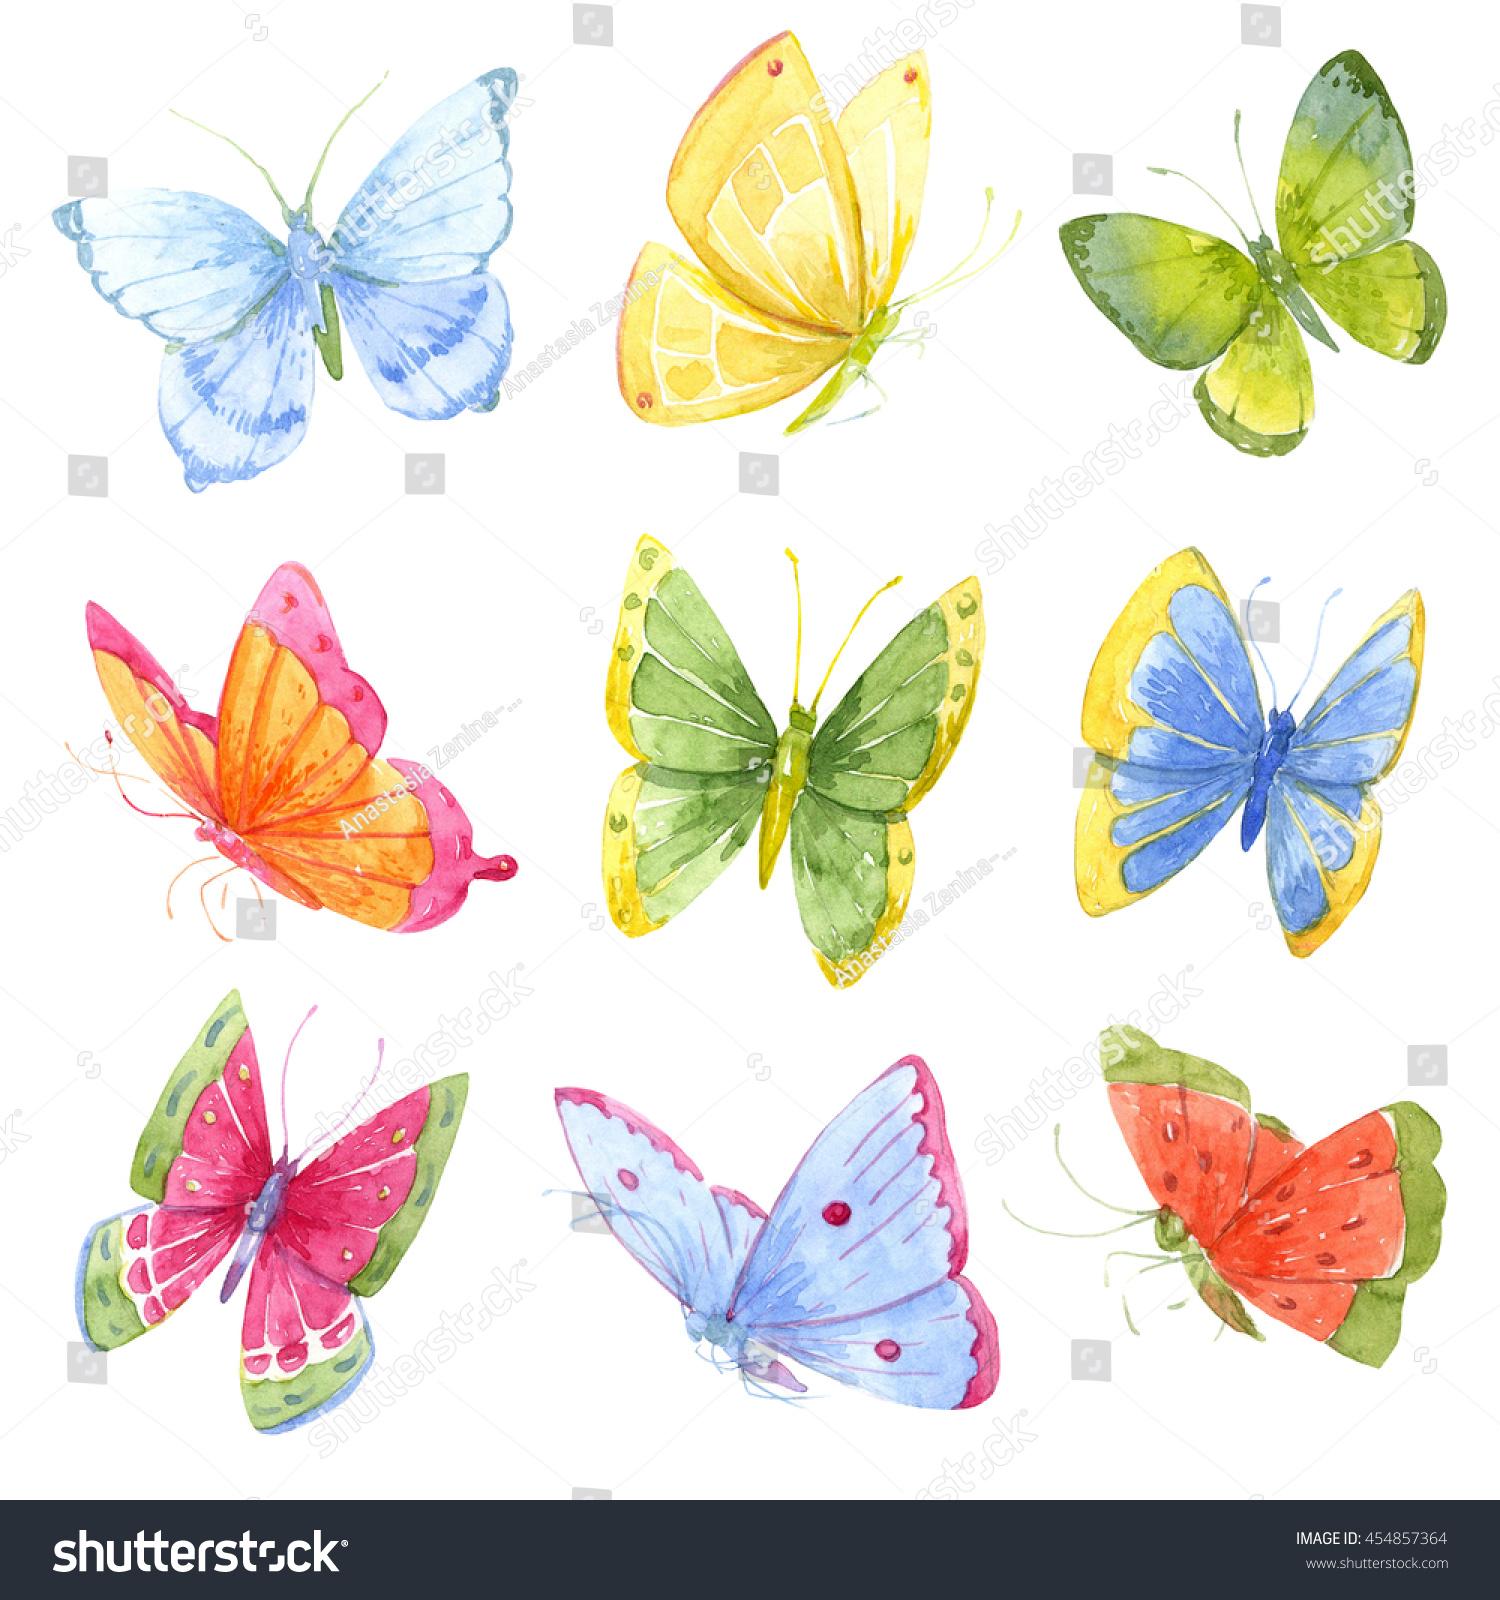 Uncategorized Images Of Butterflies For Children watercolor butterfly bright set butterflies stock a of children print